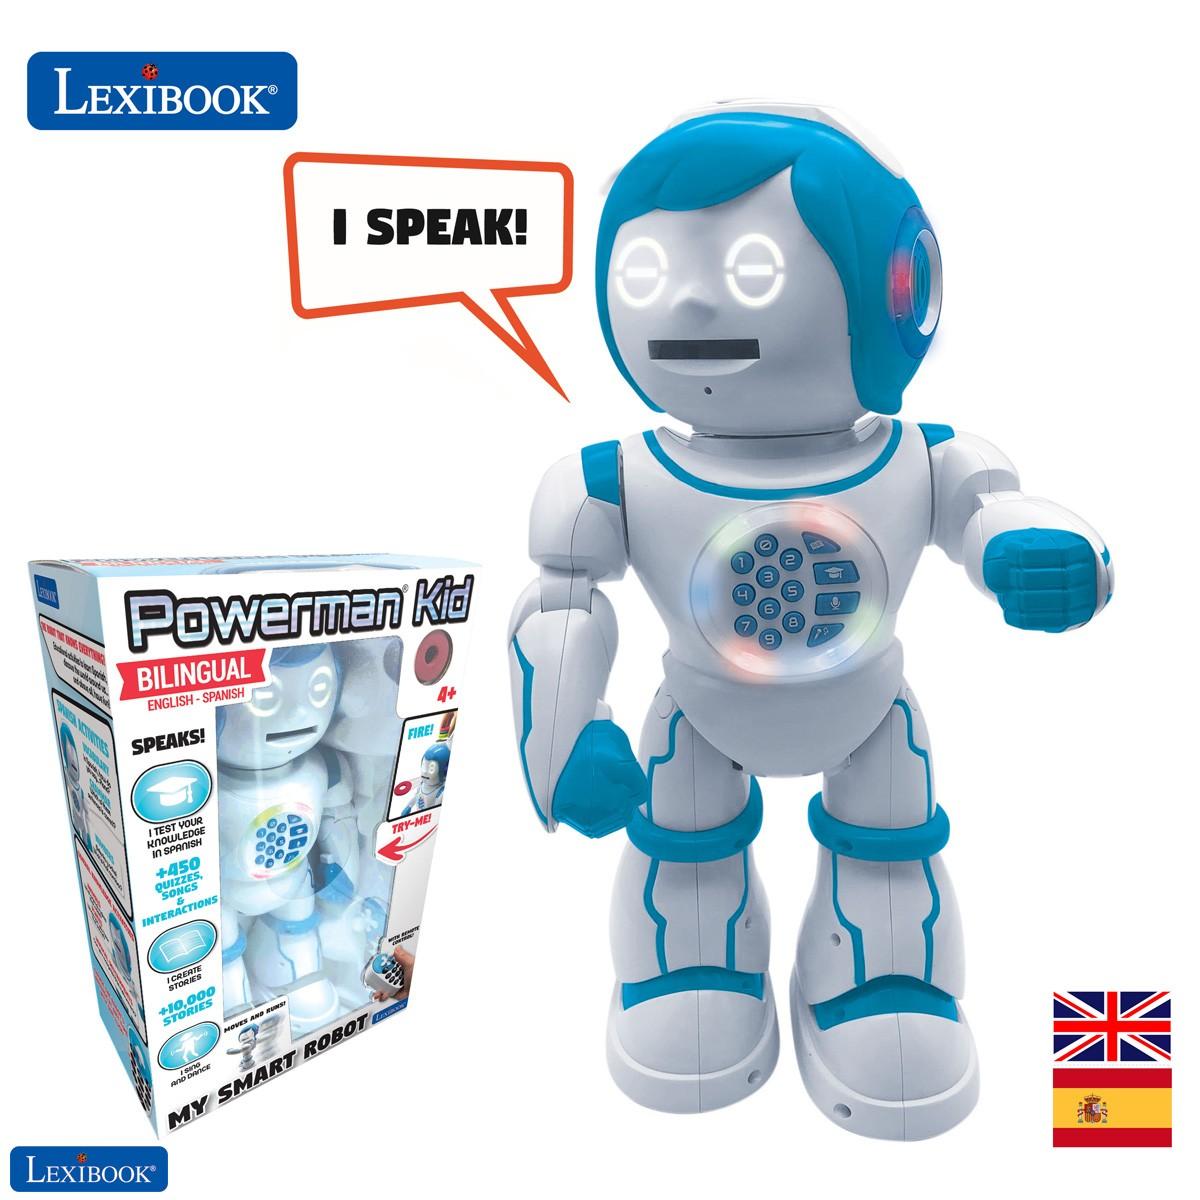 Powerman Kid - Educational and Bilingual English/Spanish Robot